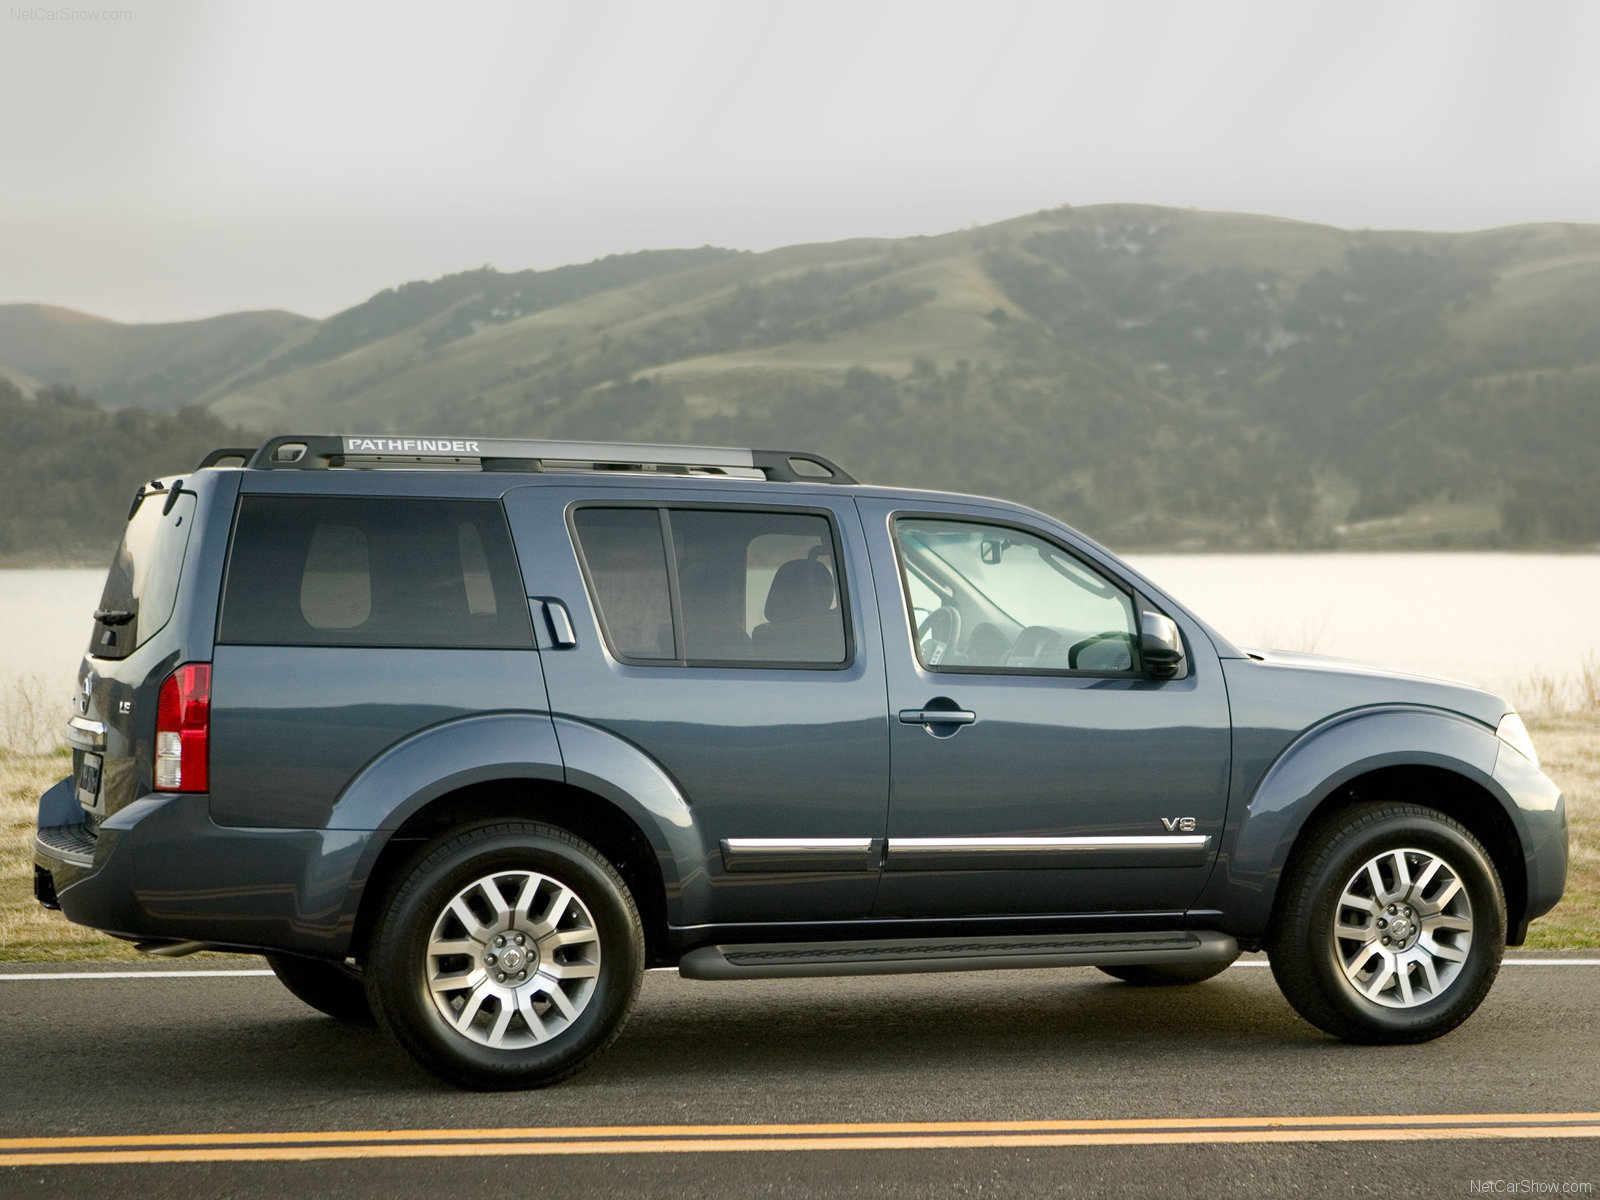 Nissan Pathfinder Images De Voitures